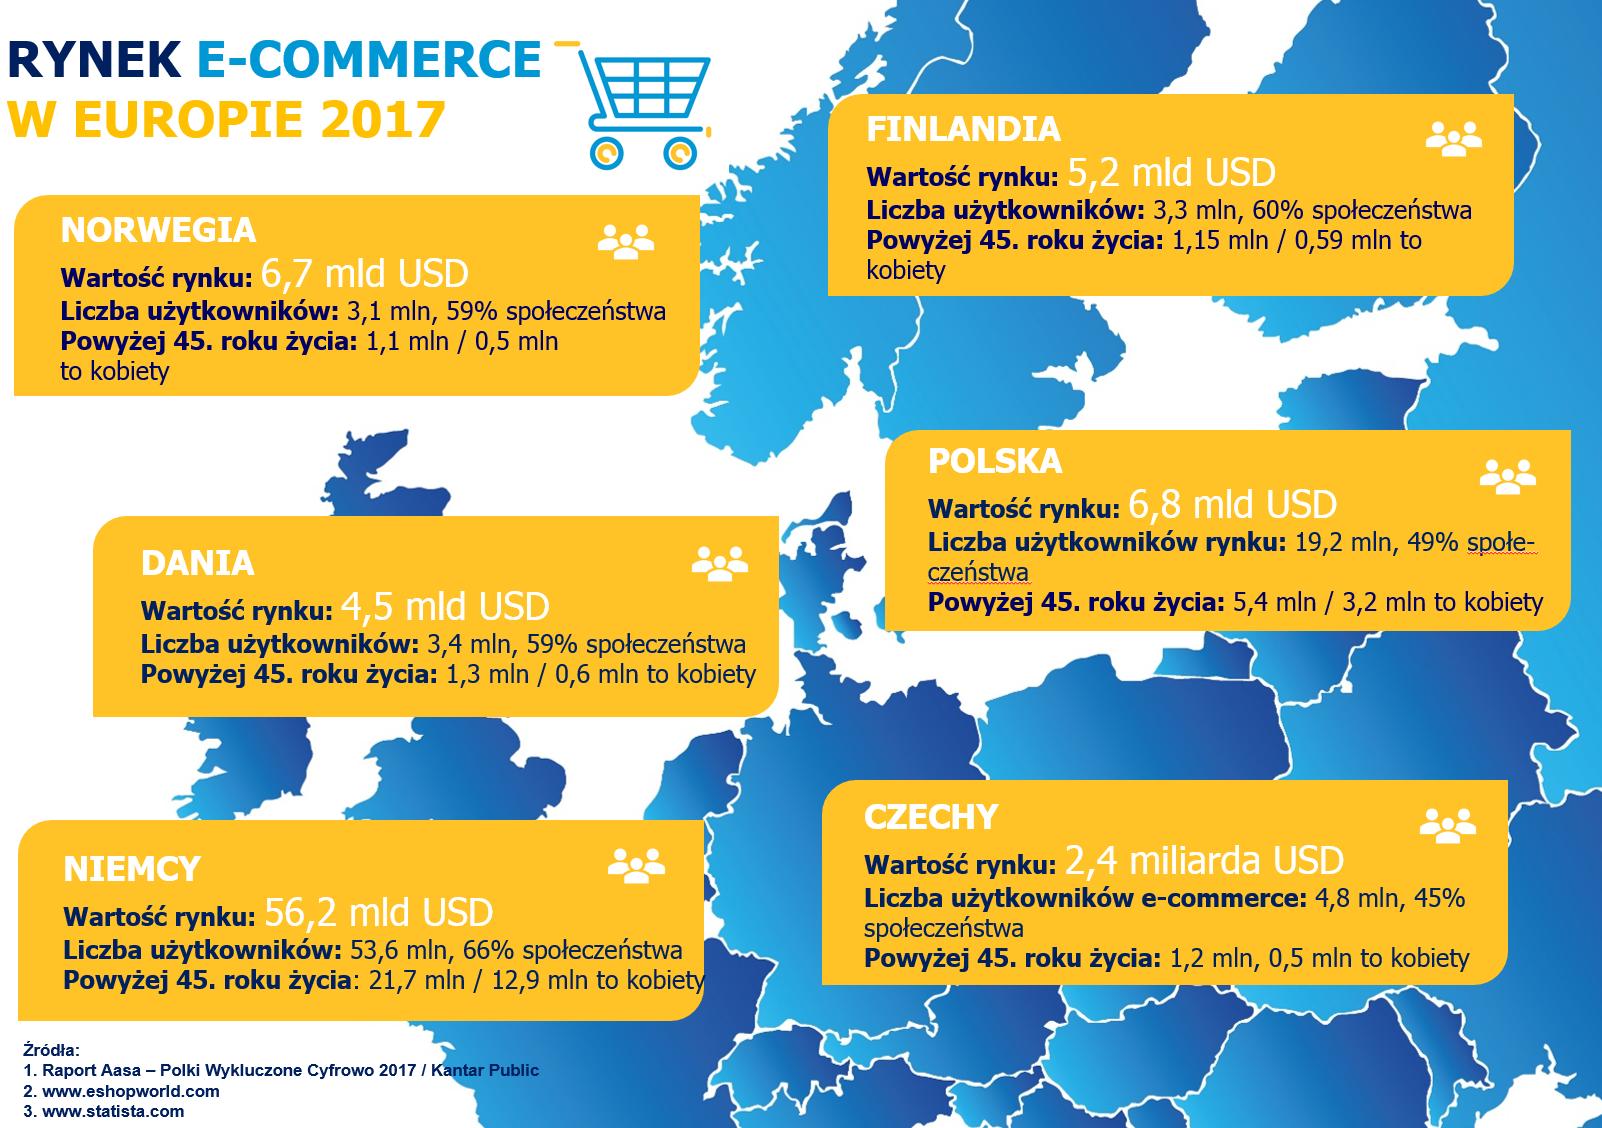 rynek e-commerce w europie 2017